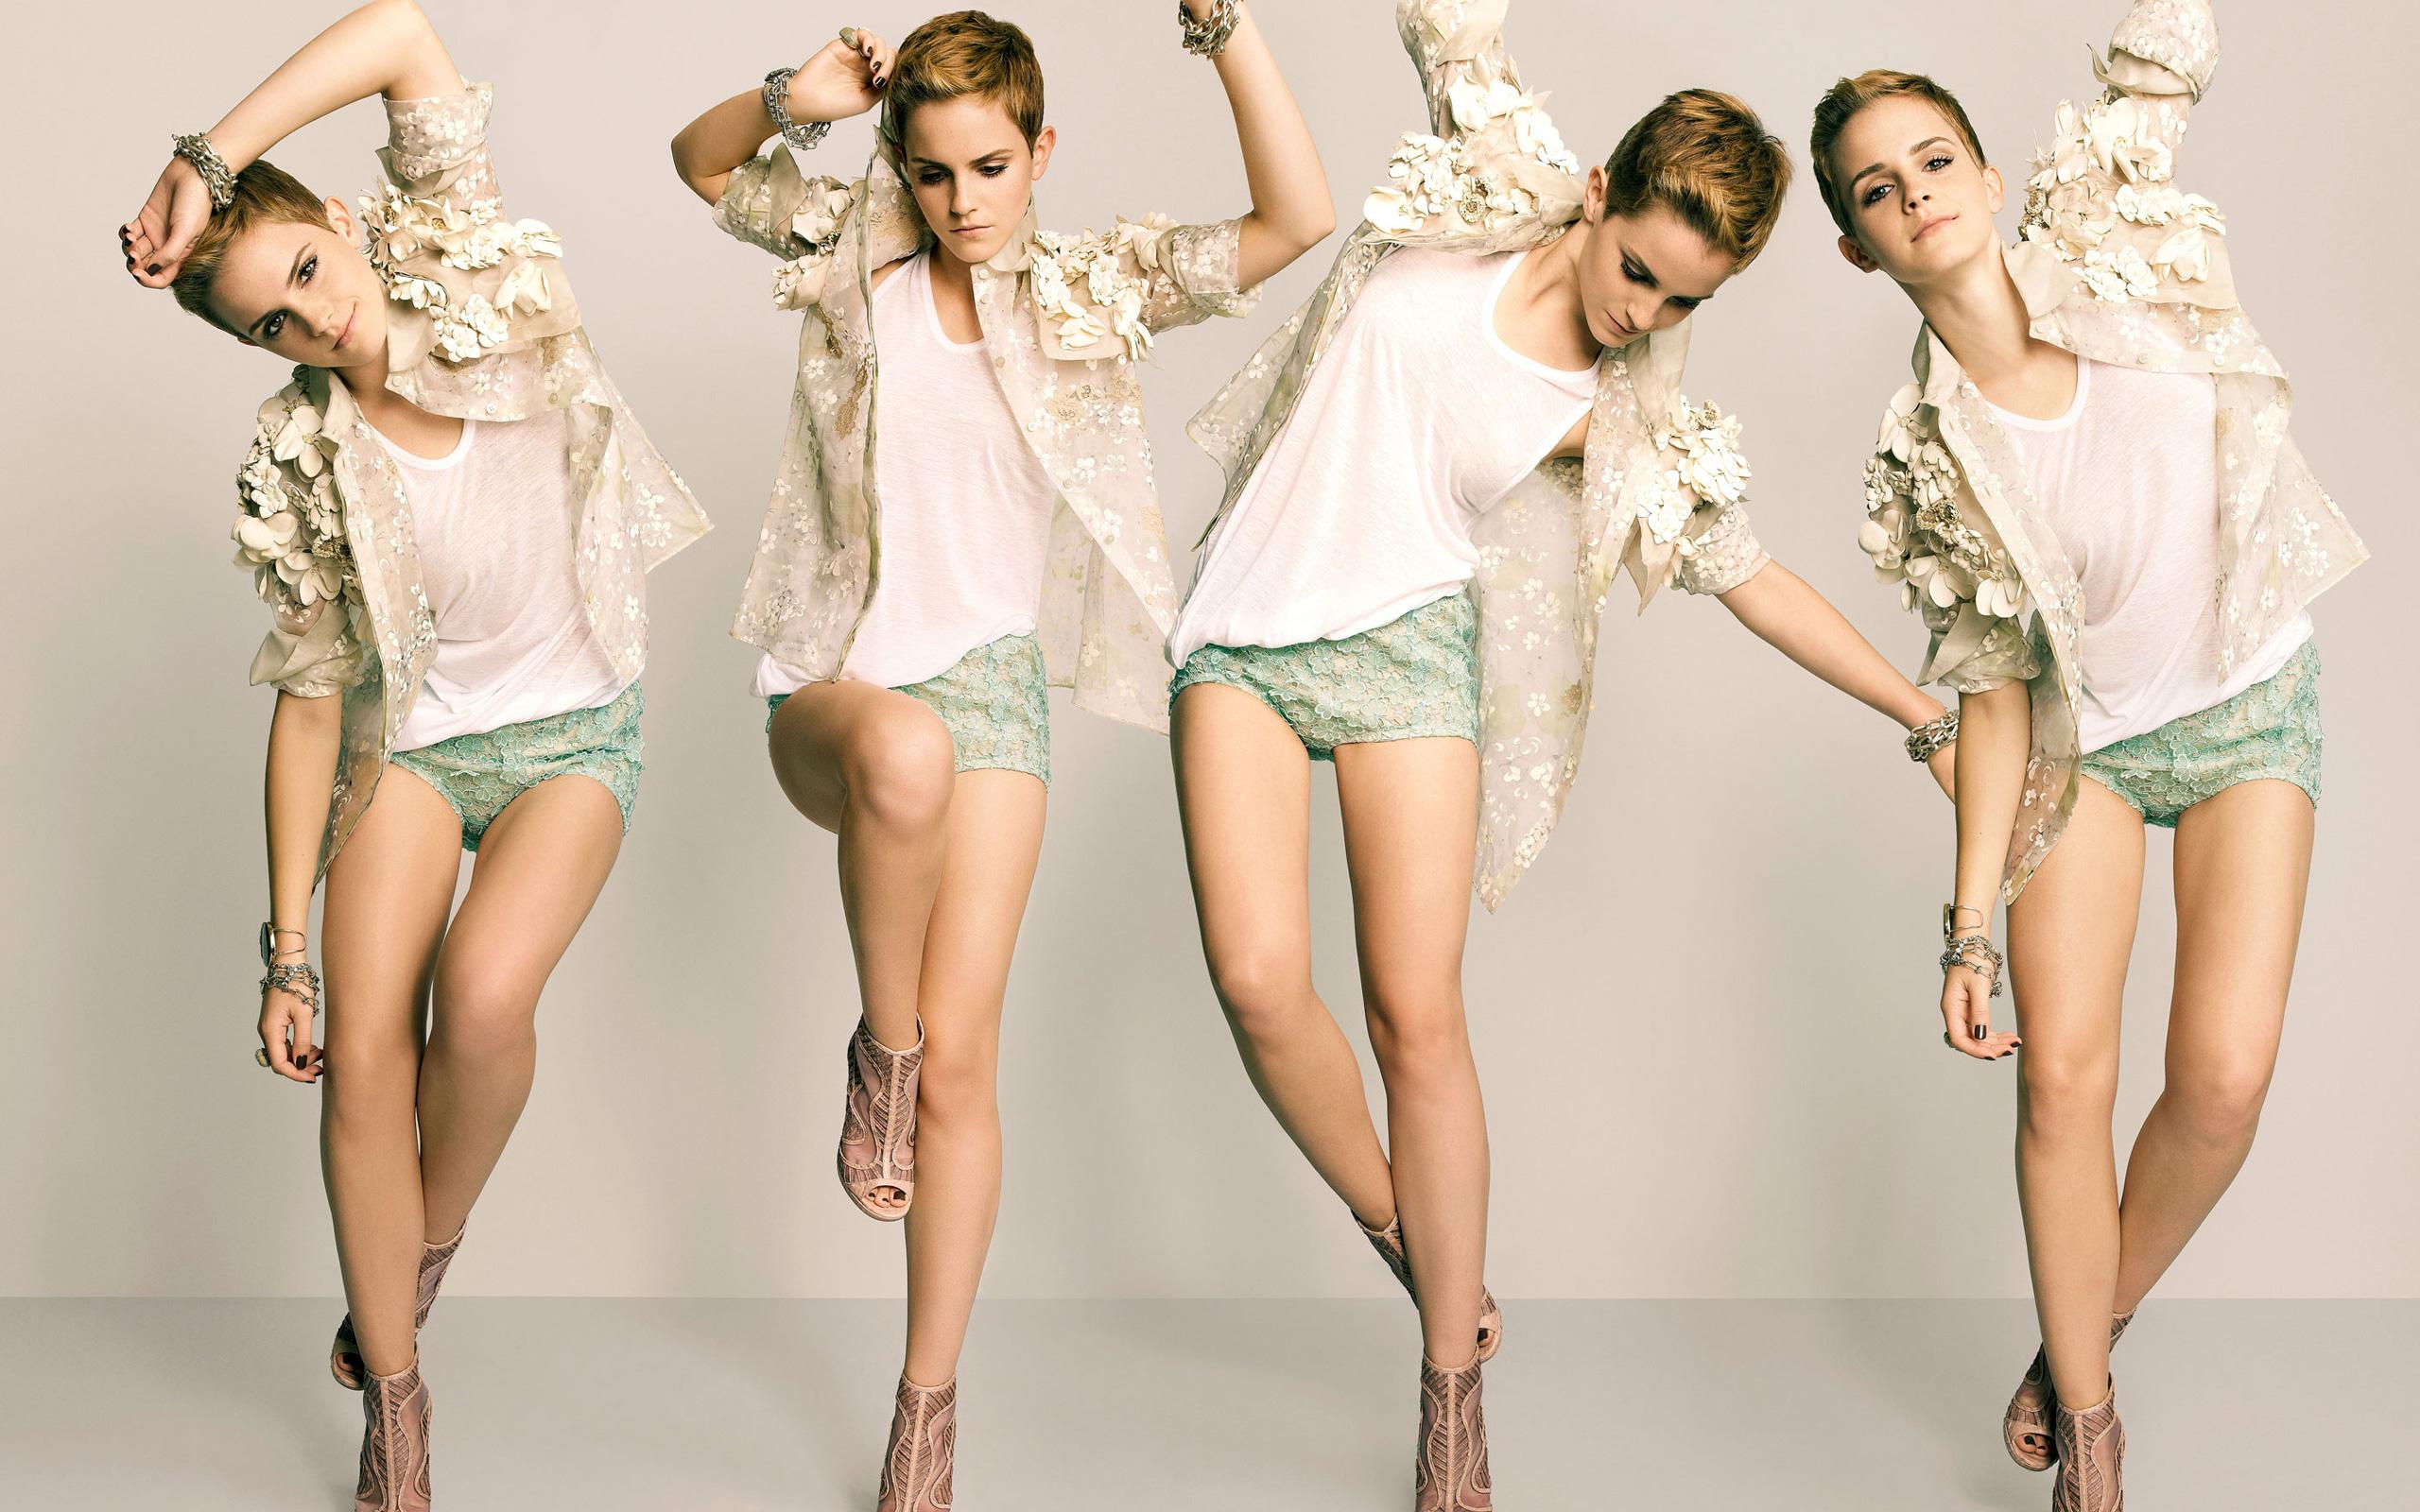 Emma Watson 265 wallpaper